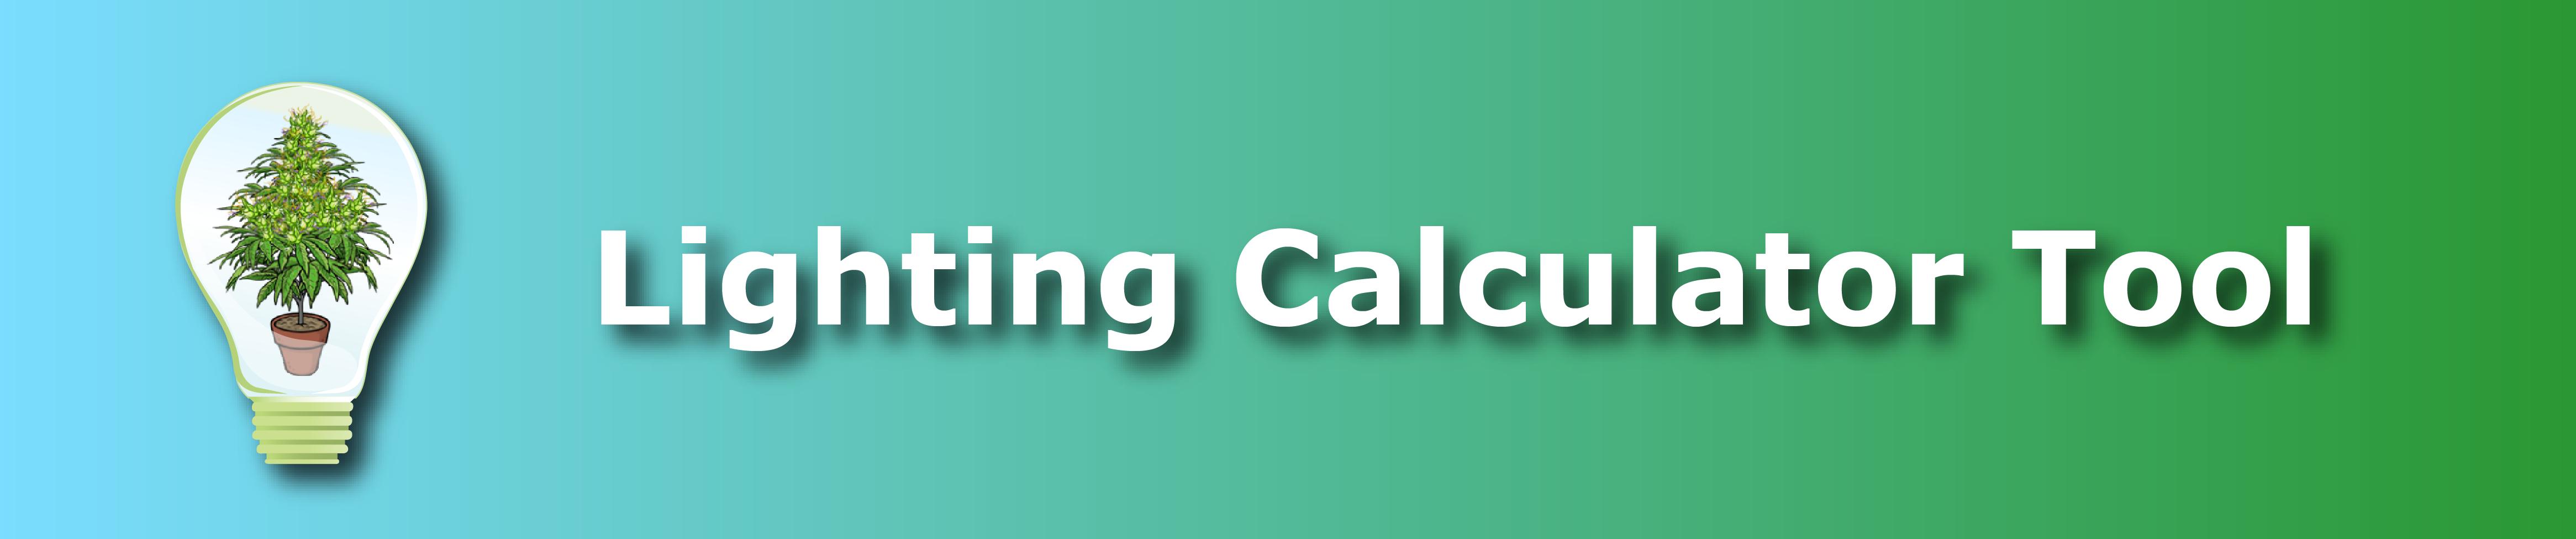 Lighting Calculator Tool